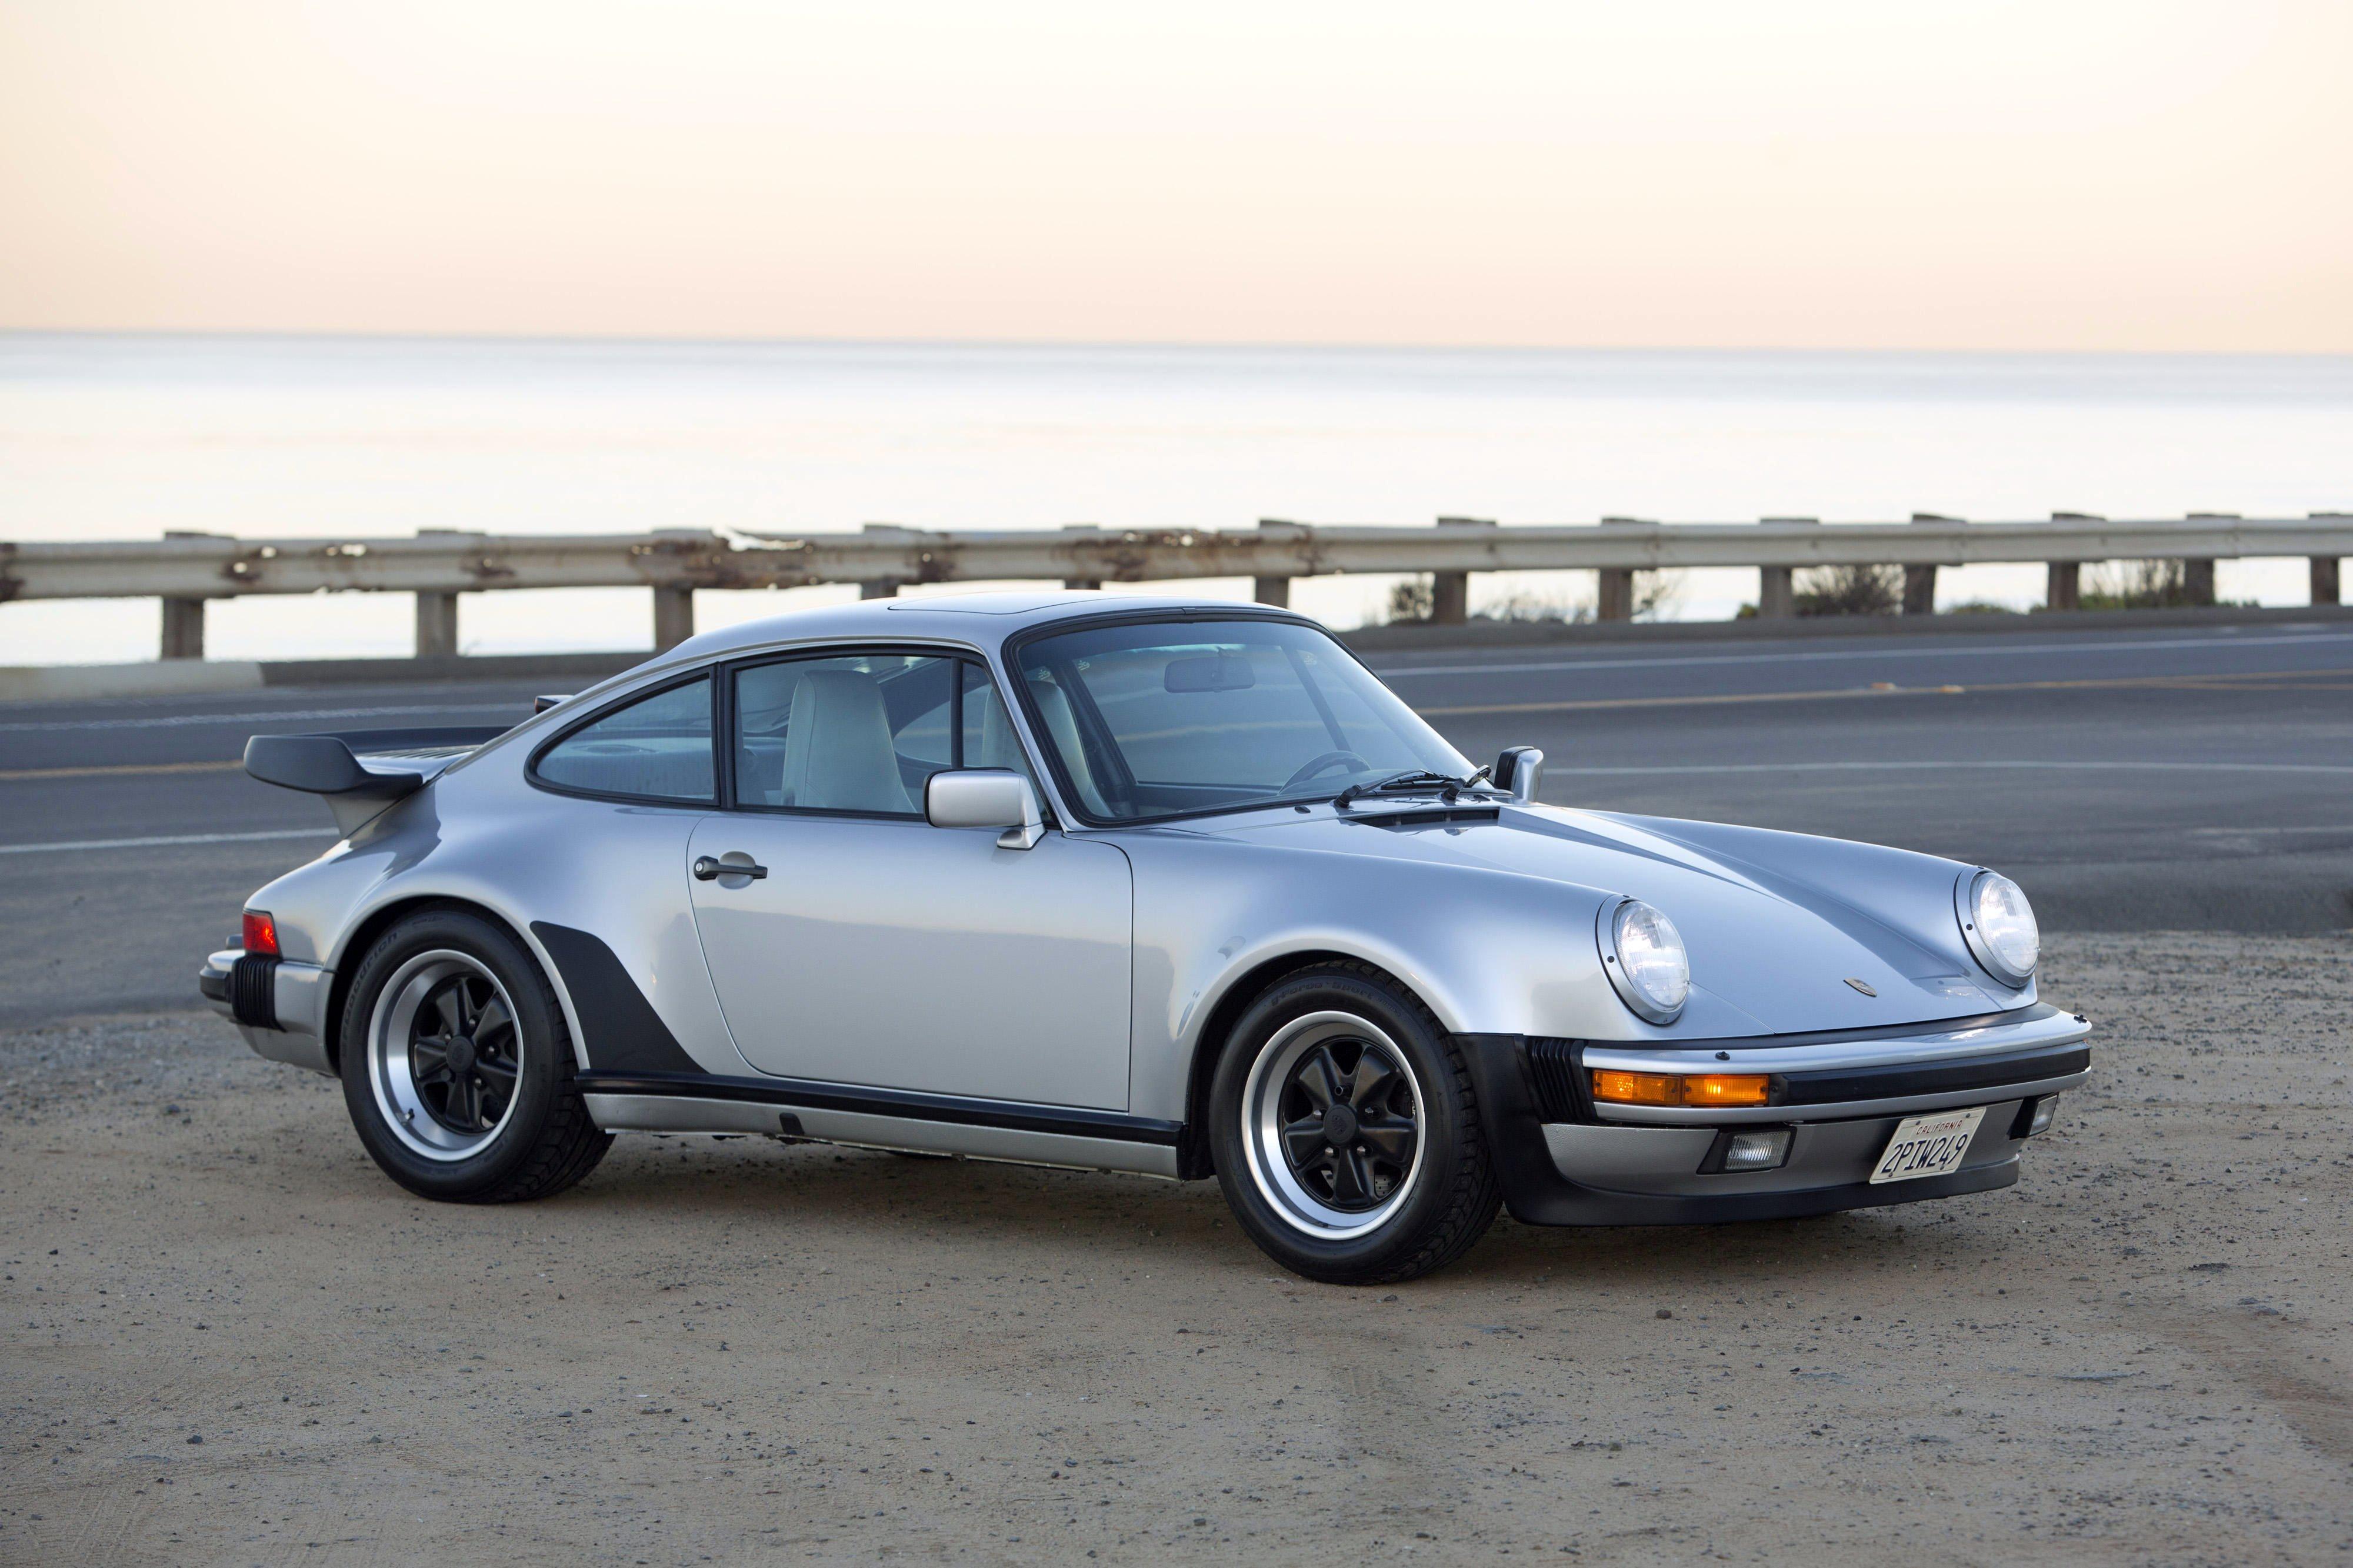 Car Wallpaper >> 1987 Porsche 911 Turbo 3-3 Coupe US-spec 930 supercar wallpaper | 4000x2666 | 557651 | WallpaperUP